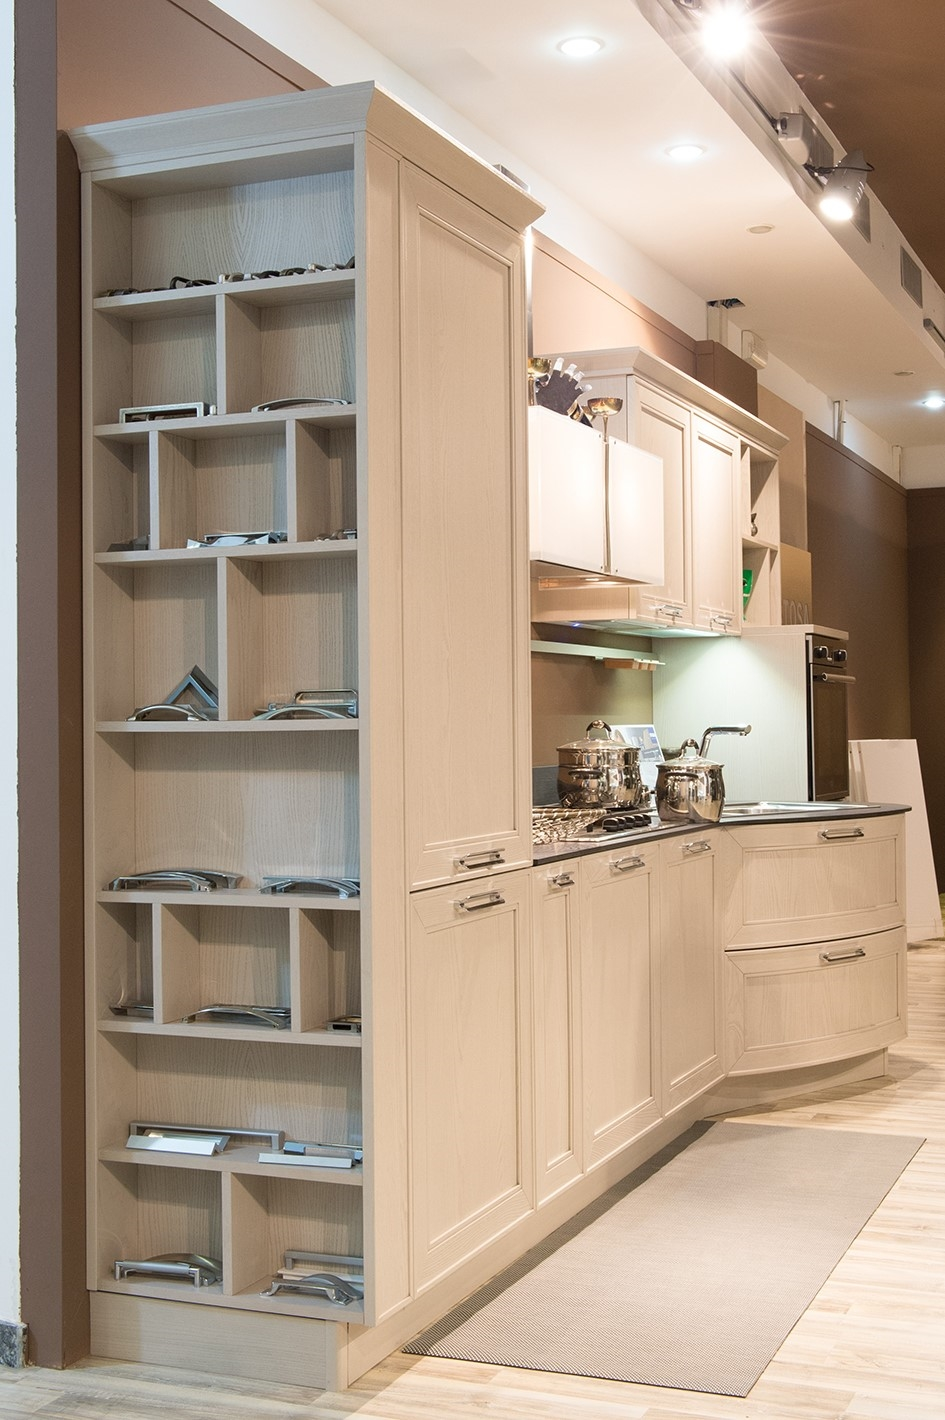 Stunning Cucina Ad Isola Dwg Gallery - Embercreative.us ...